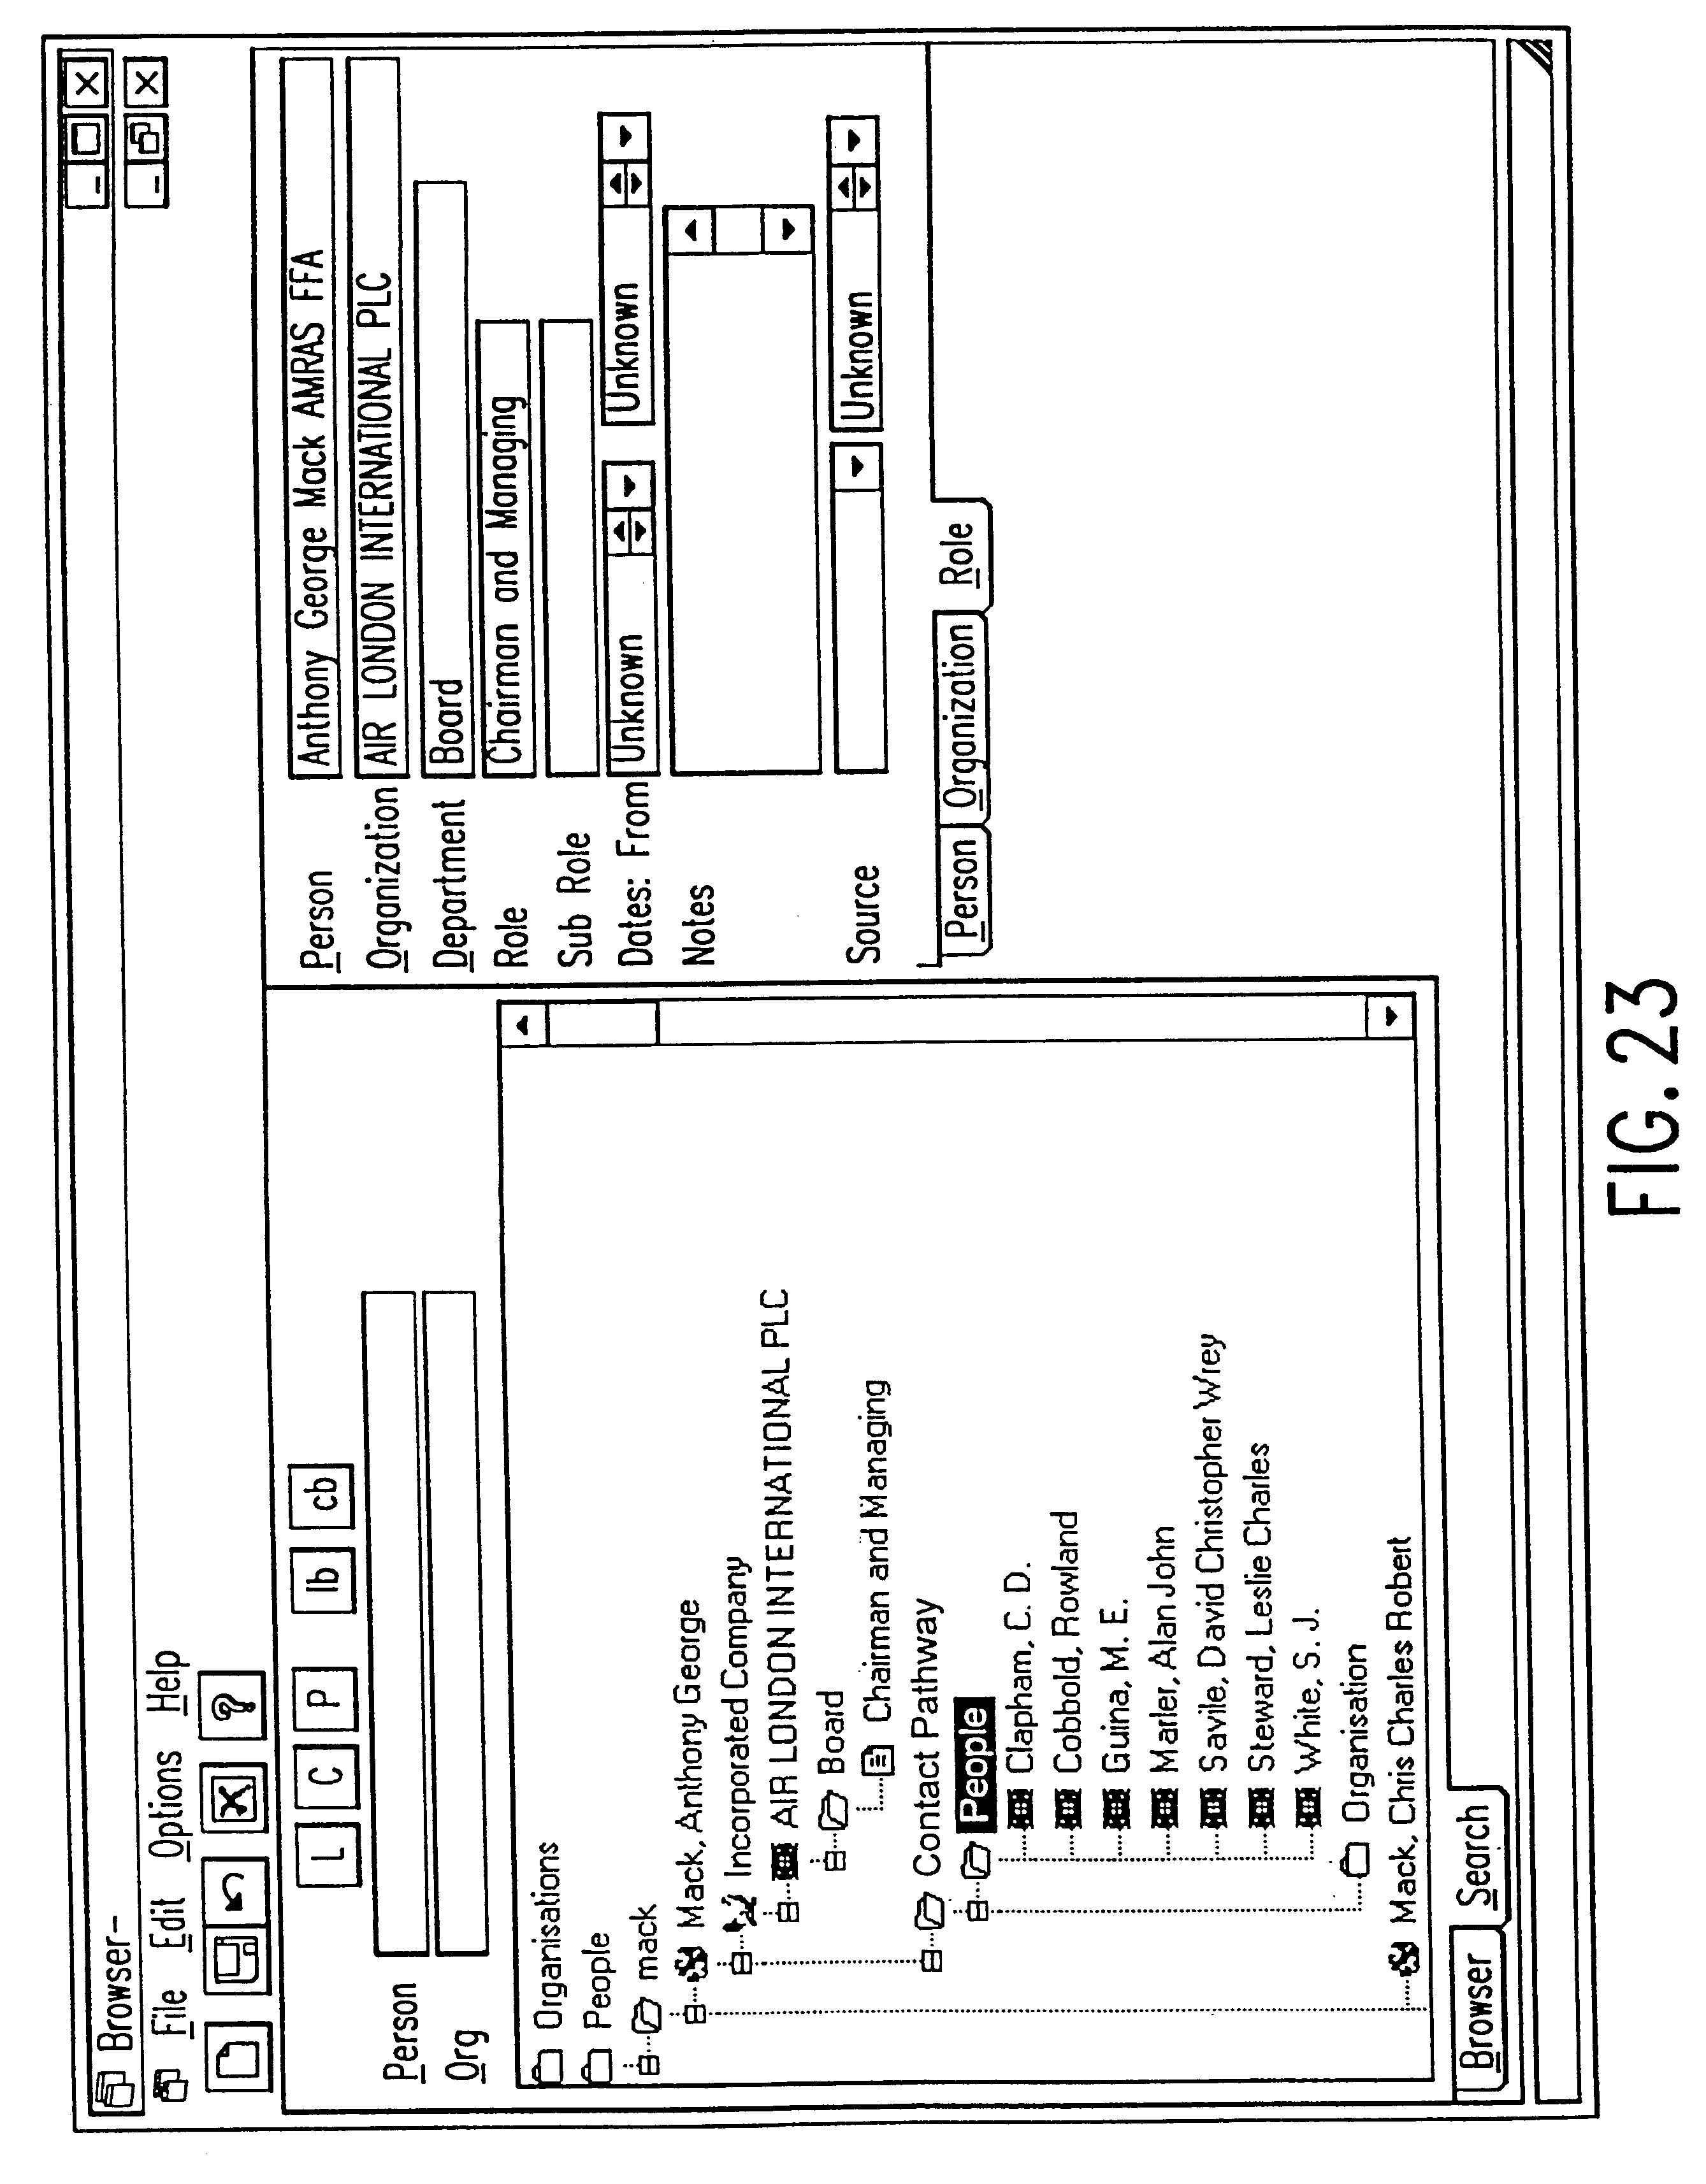 Patent US 6,324,541 B1 on